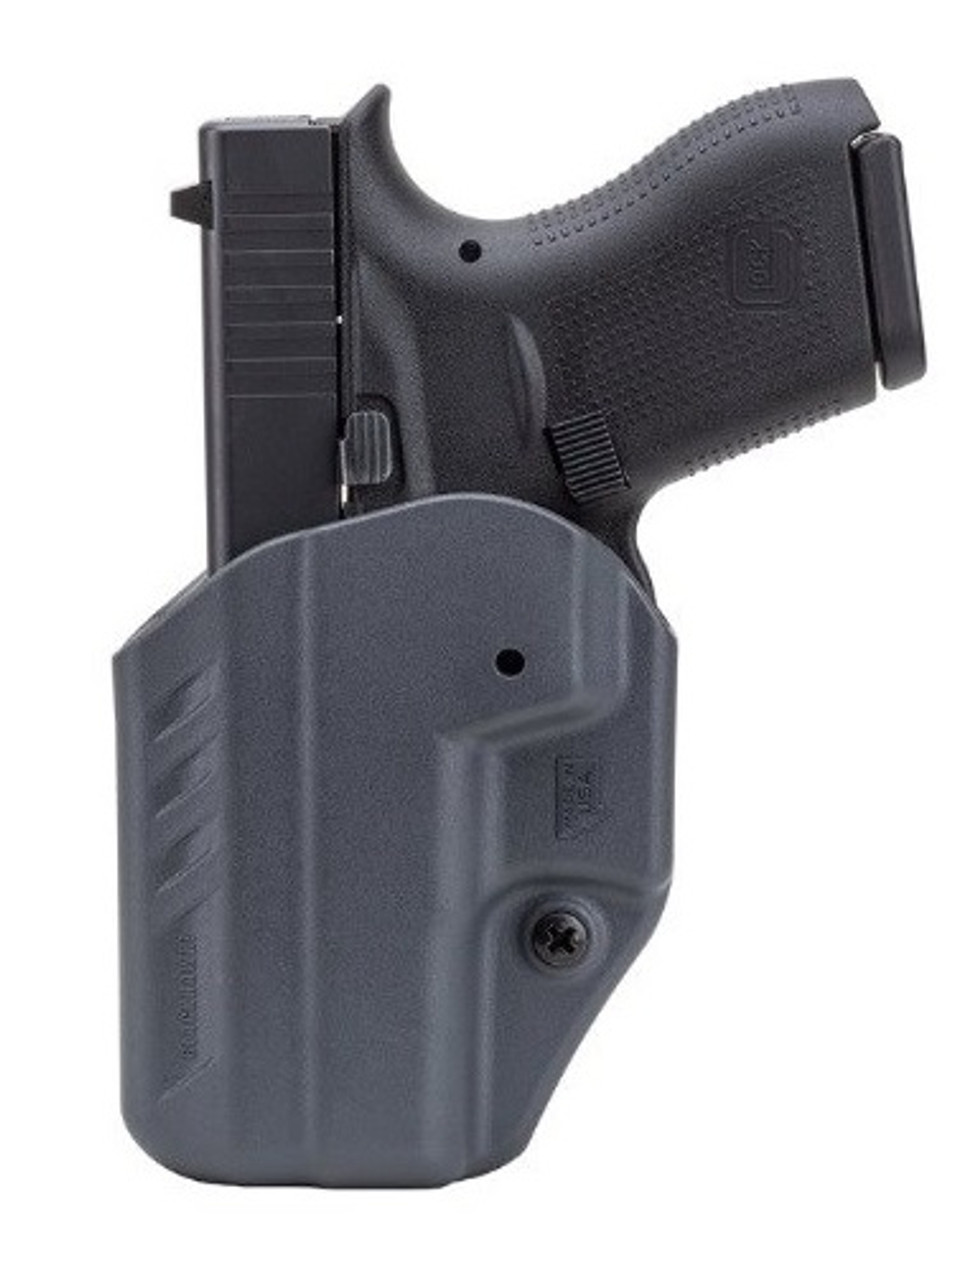 BLACKHAWK A.R.C IWB Ambidextrous Holster Glock 43 417568UG